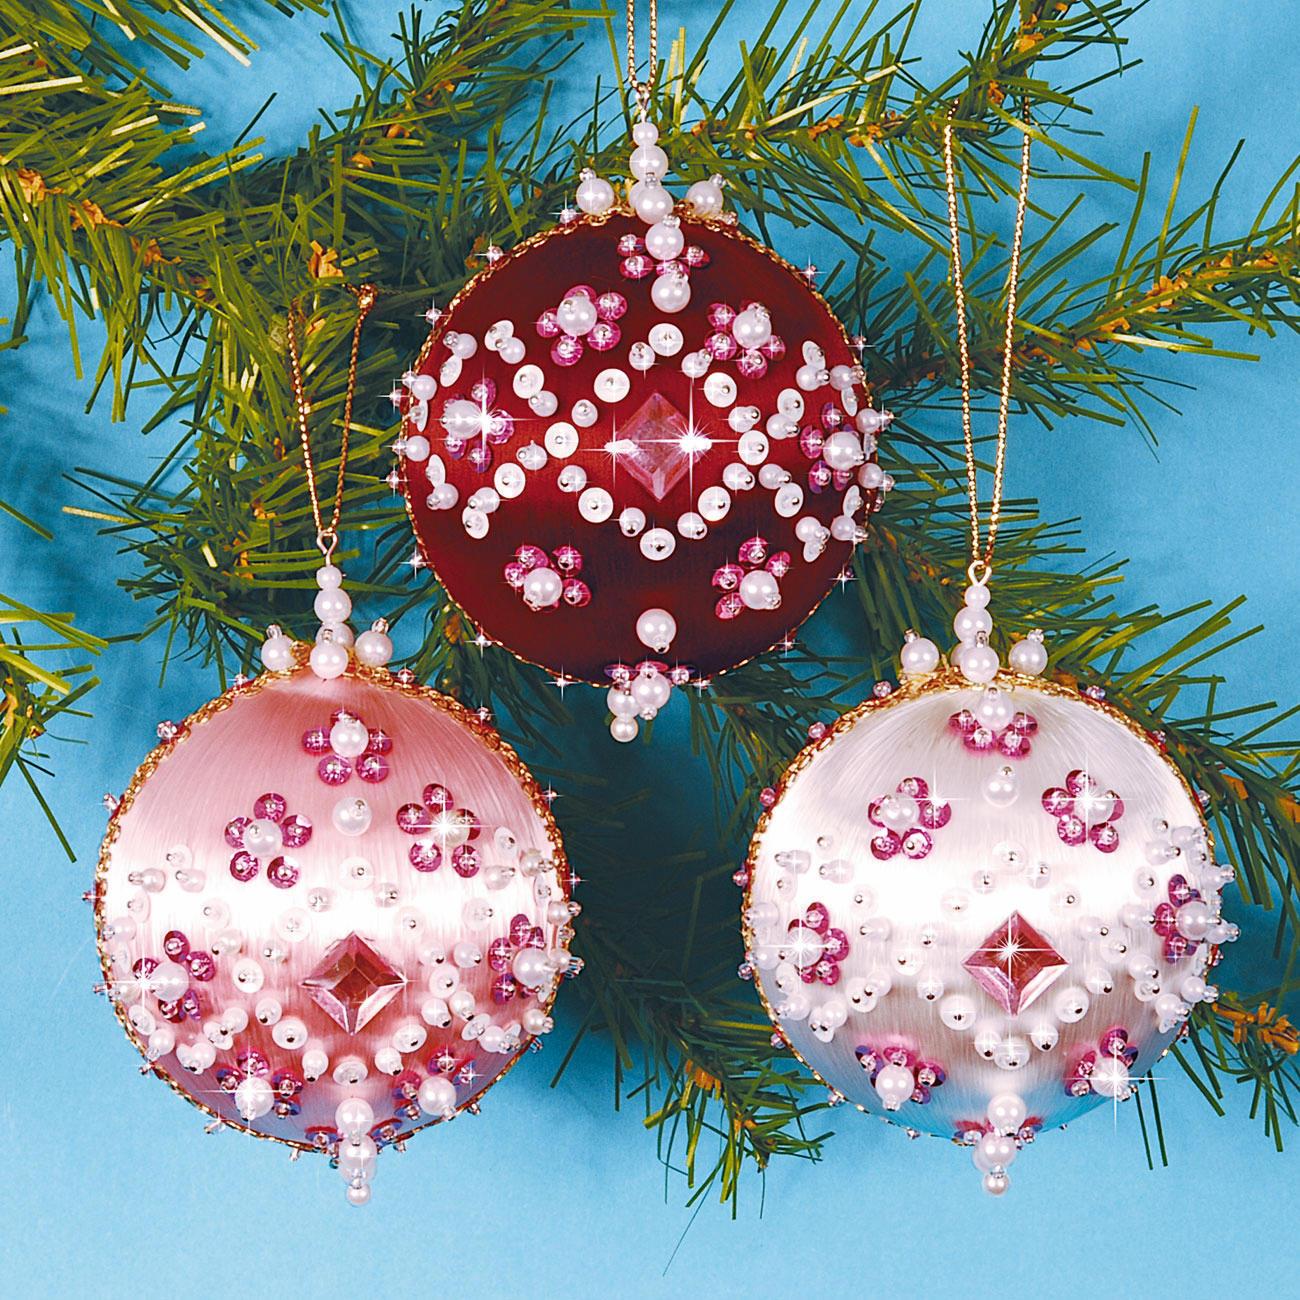 3 christbaumkugeln glanzfaden im set 3 versch farben - Christbaumkugeln selber machen ...